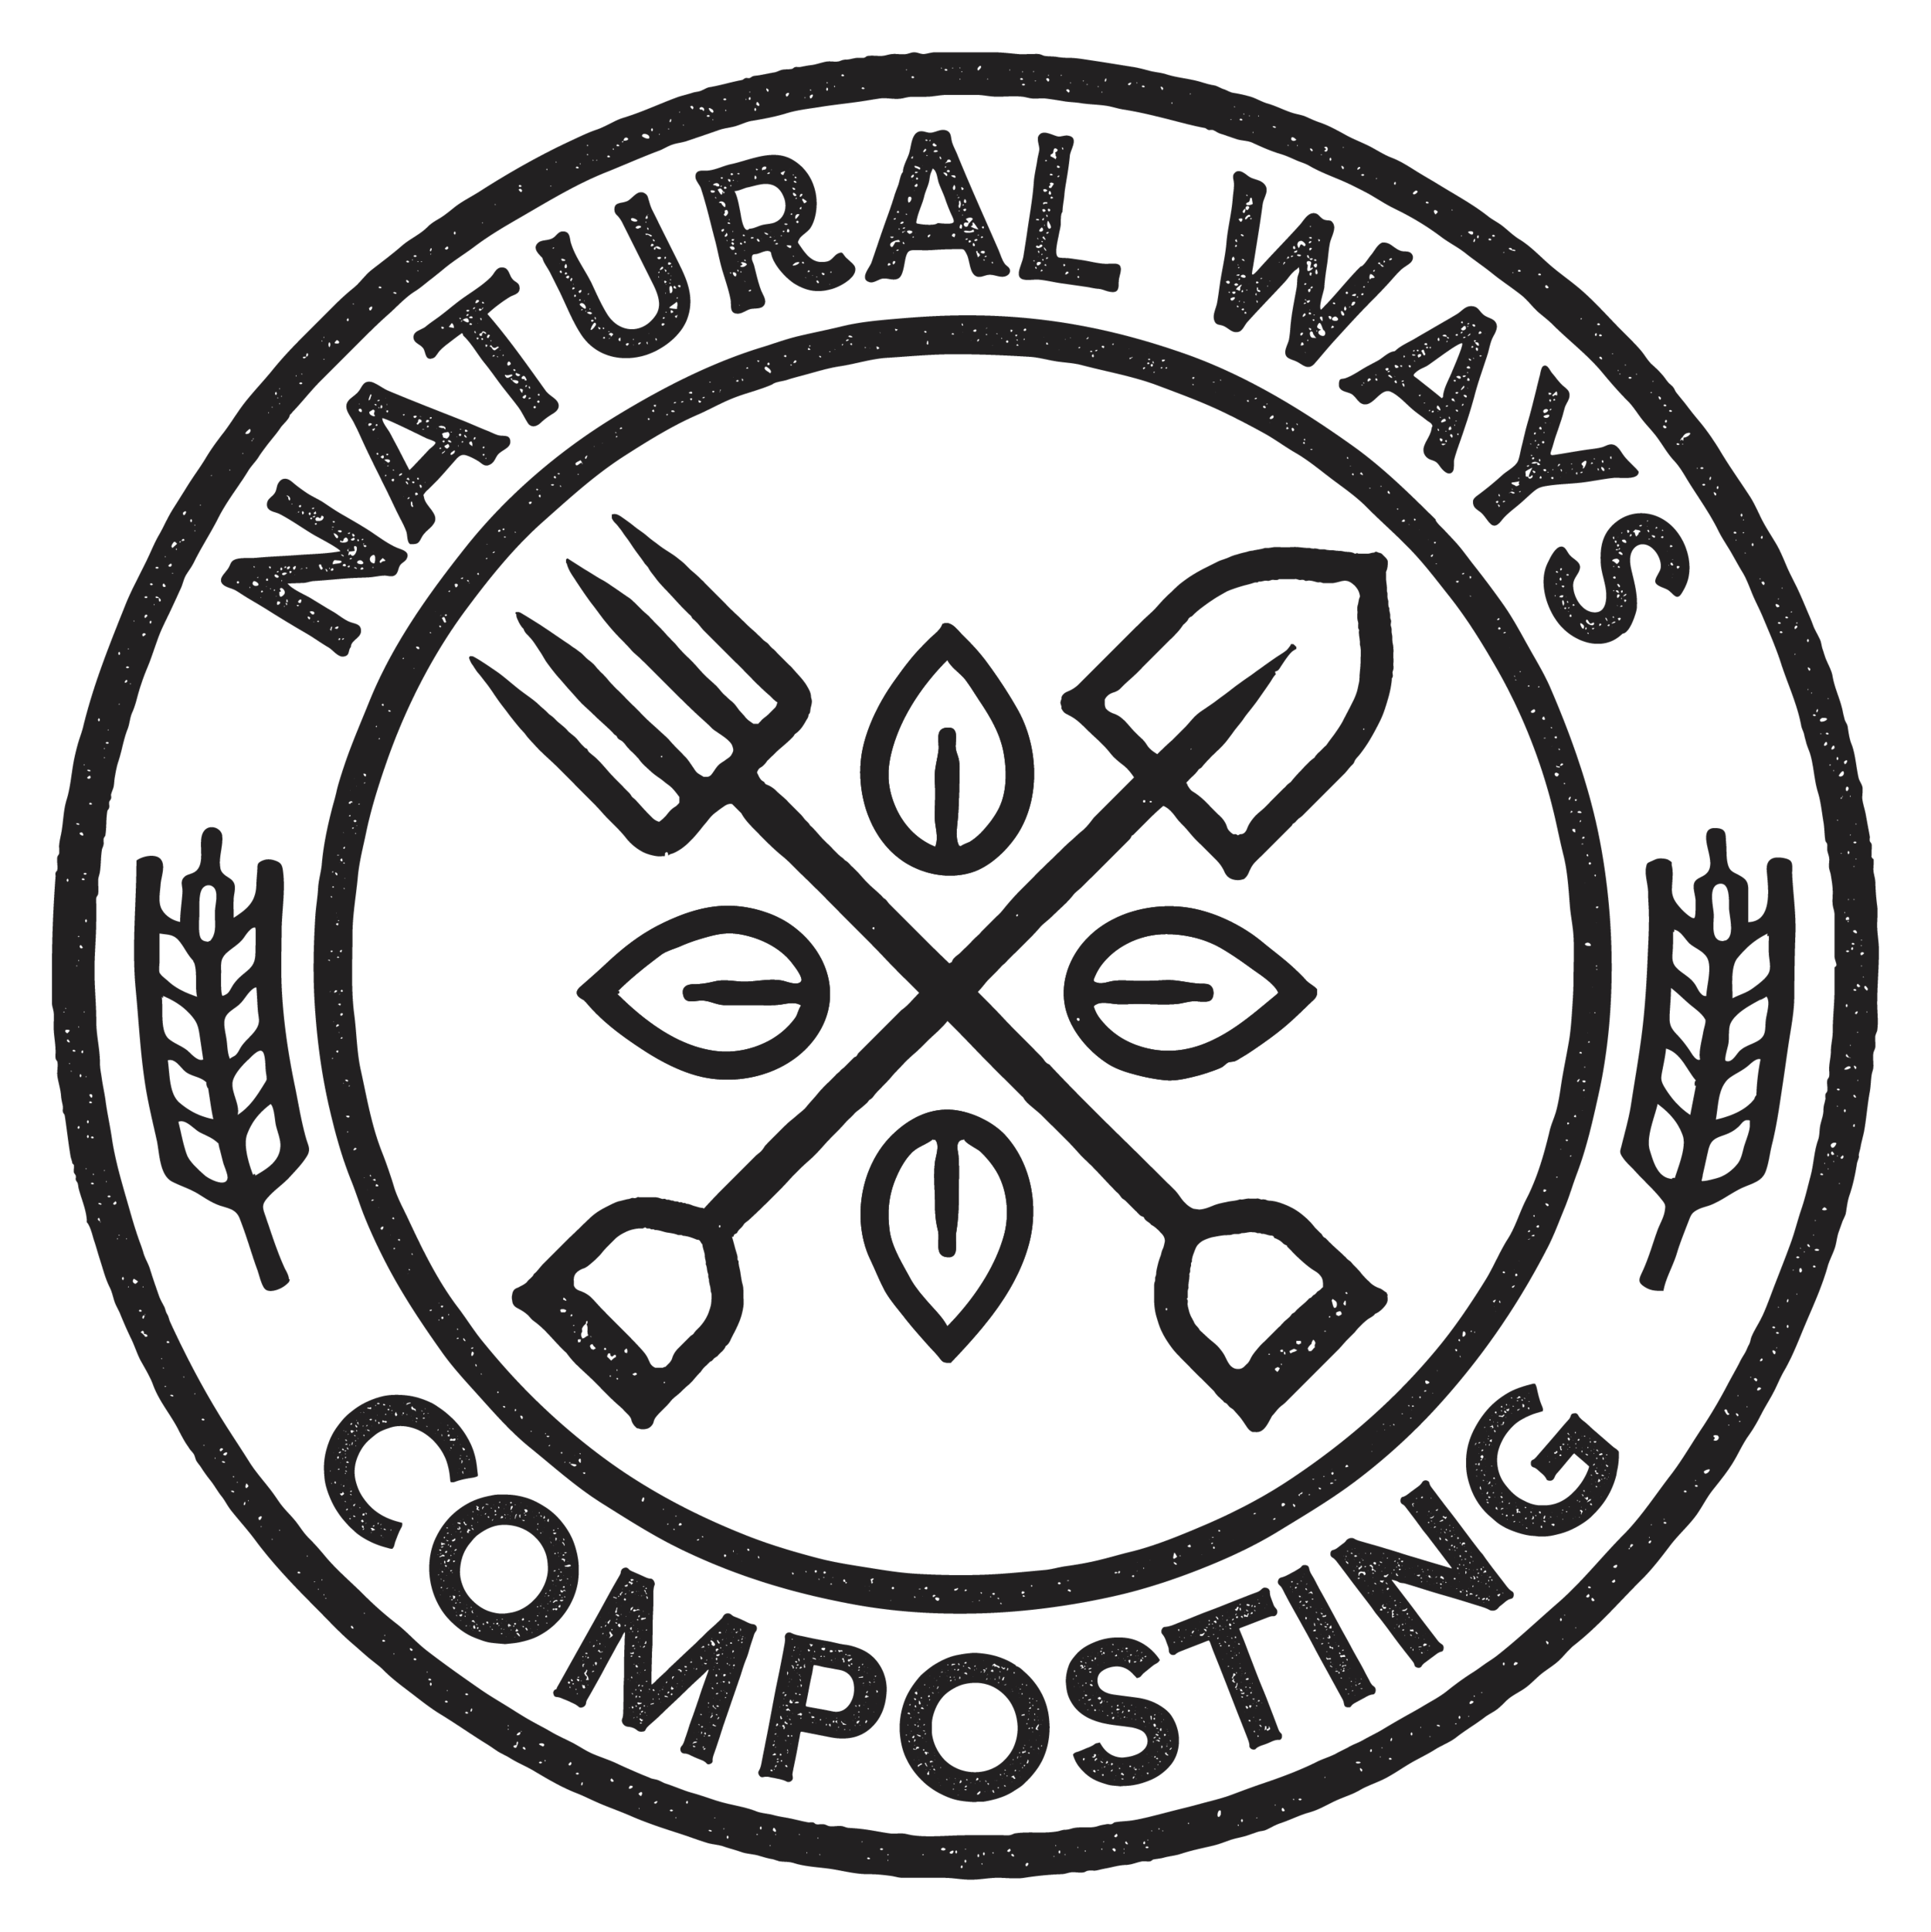 Natural Ways Composting logo (RGB).png